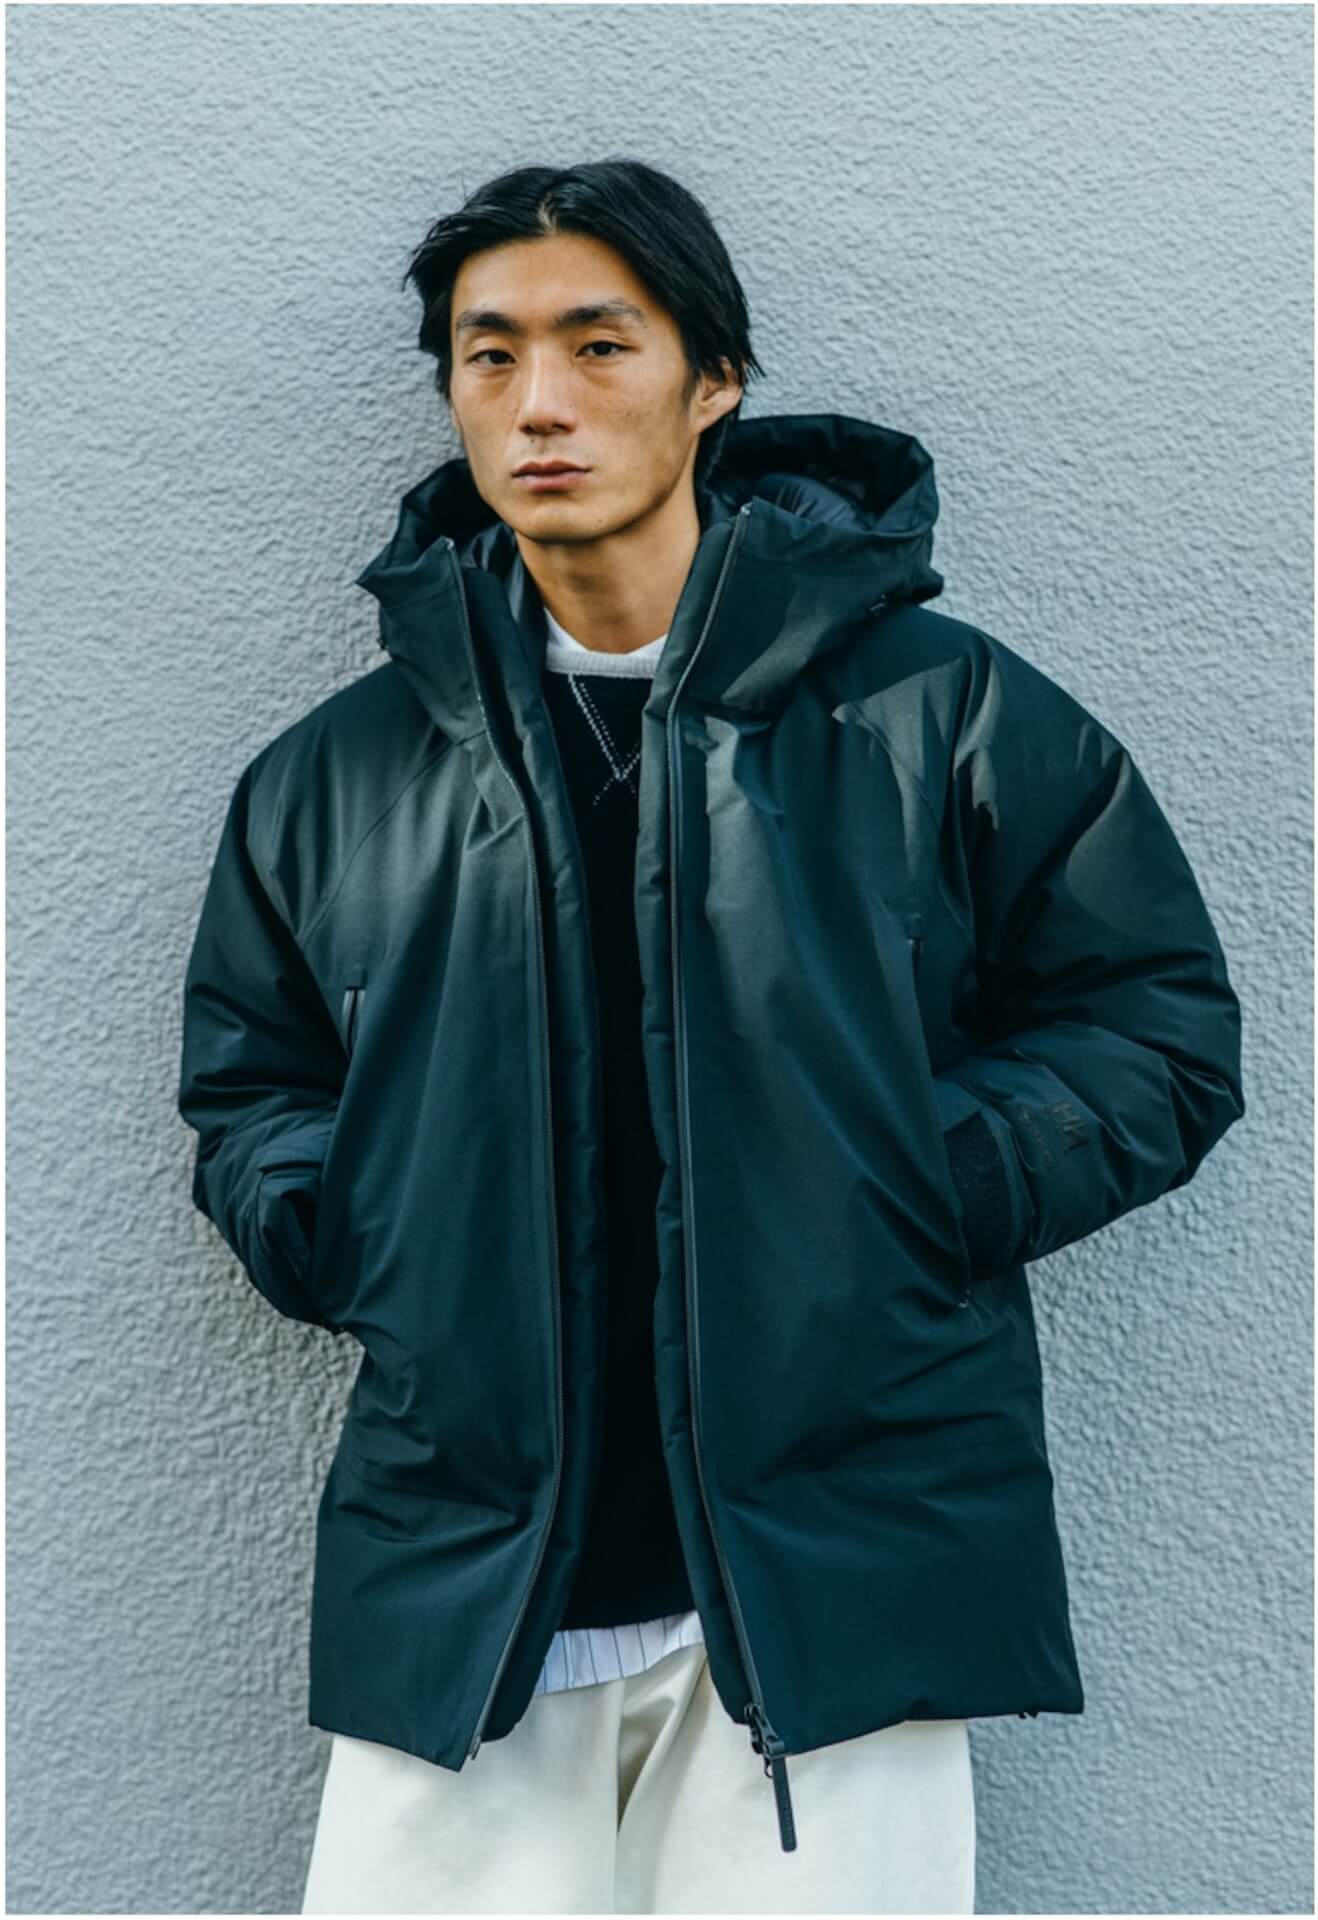 HELLY HANSENから防水透湿性を兼ね備えたハイロフトダウン『Hemsedal Jacket』&『Mager Insulation Jacket』が登場! fashion201215_hellyhansen_down_2